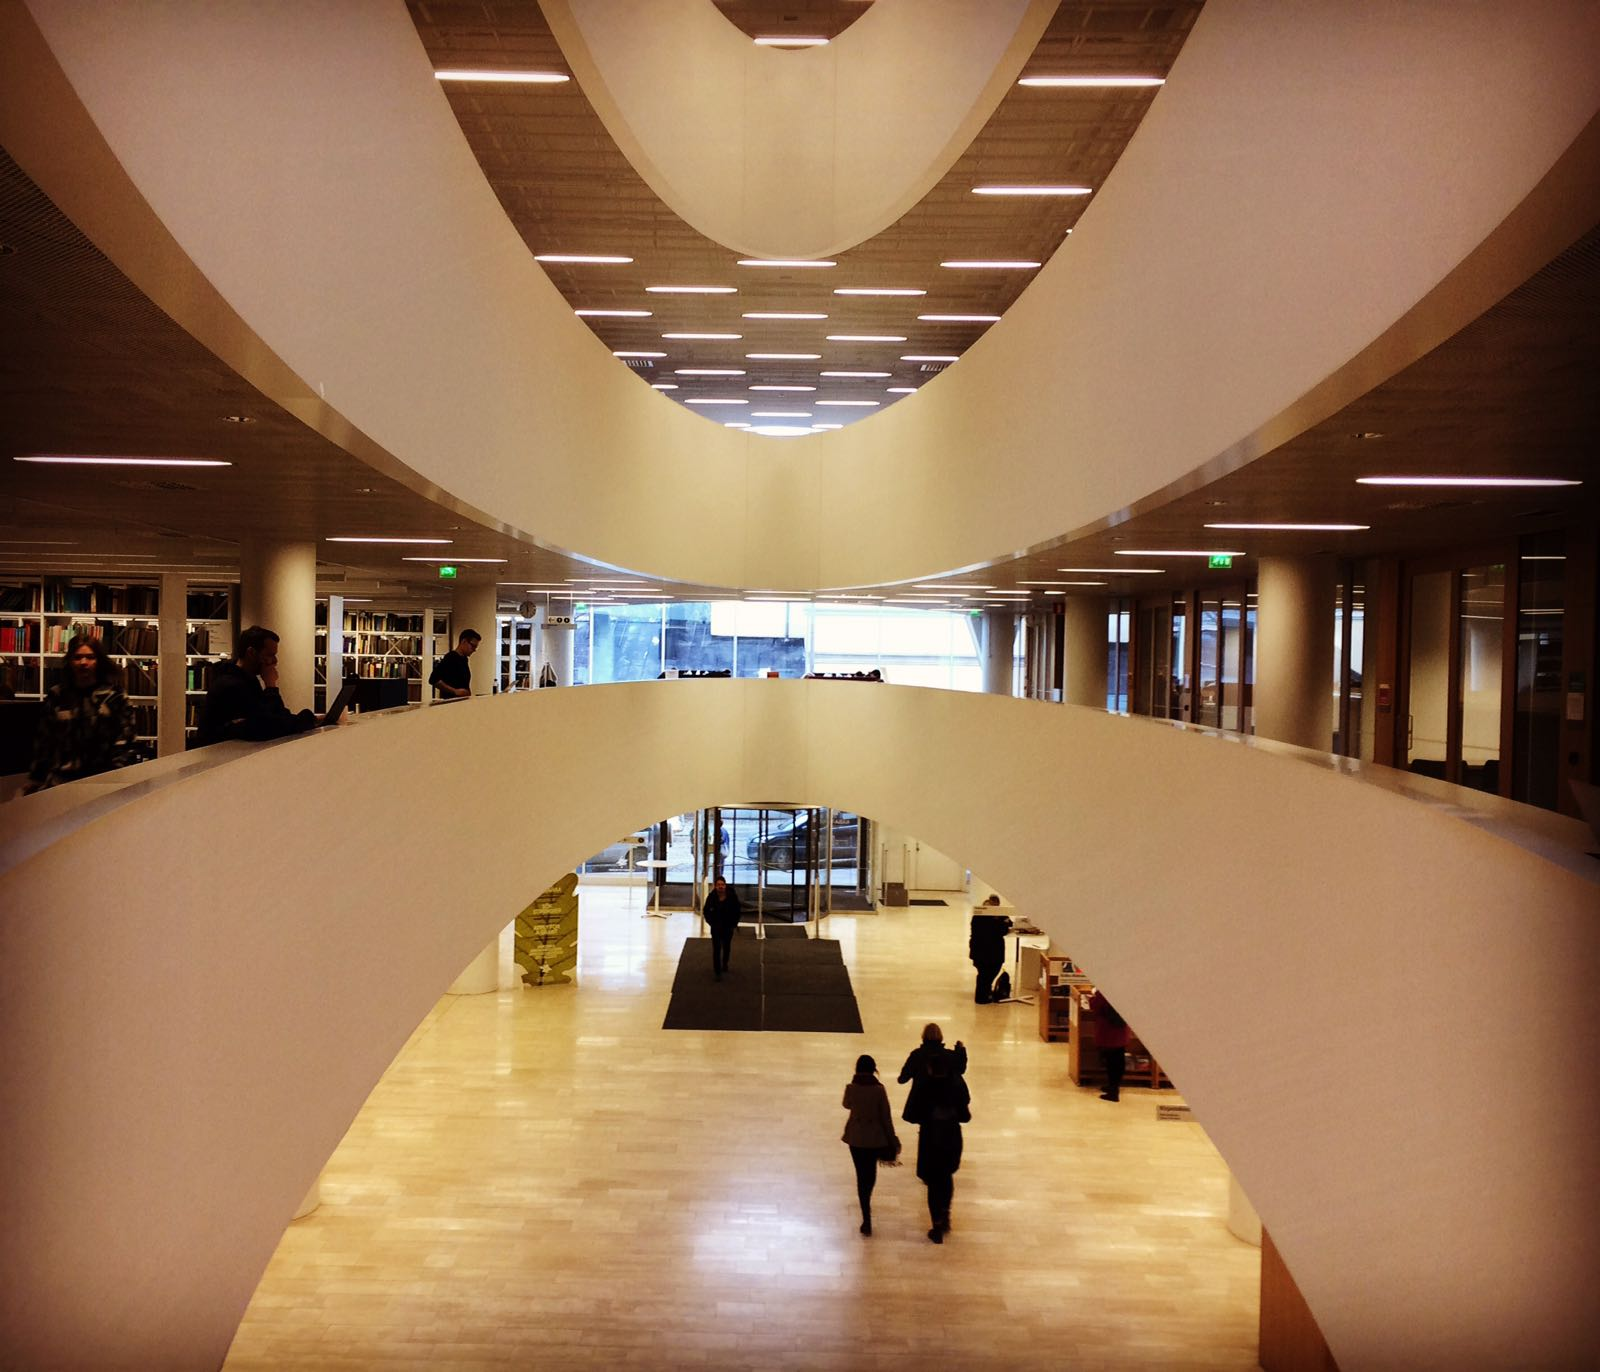 Kaisa Helsinki University Library Finlandia